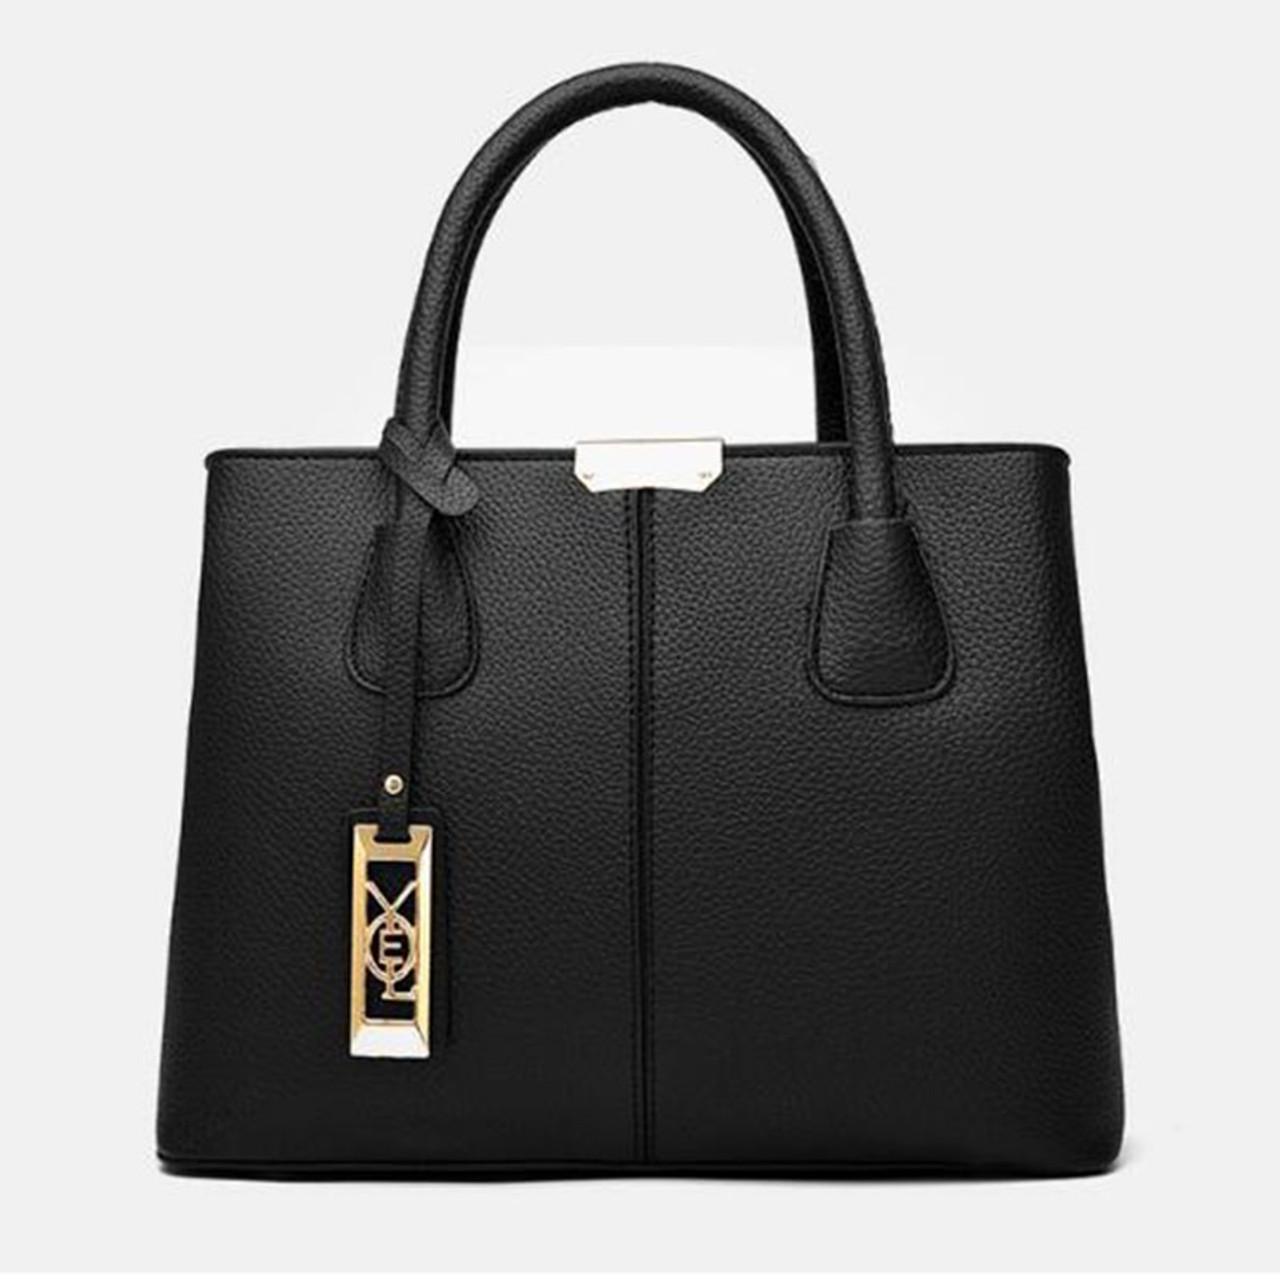 ... New Arrival PU Leather Handbags Casual Women Shoulder Bag Designers  Ladies Hand Bags Simple Style Crossbody ... edc6b44cd4